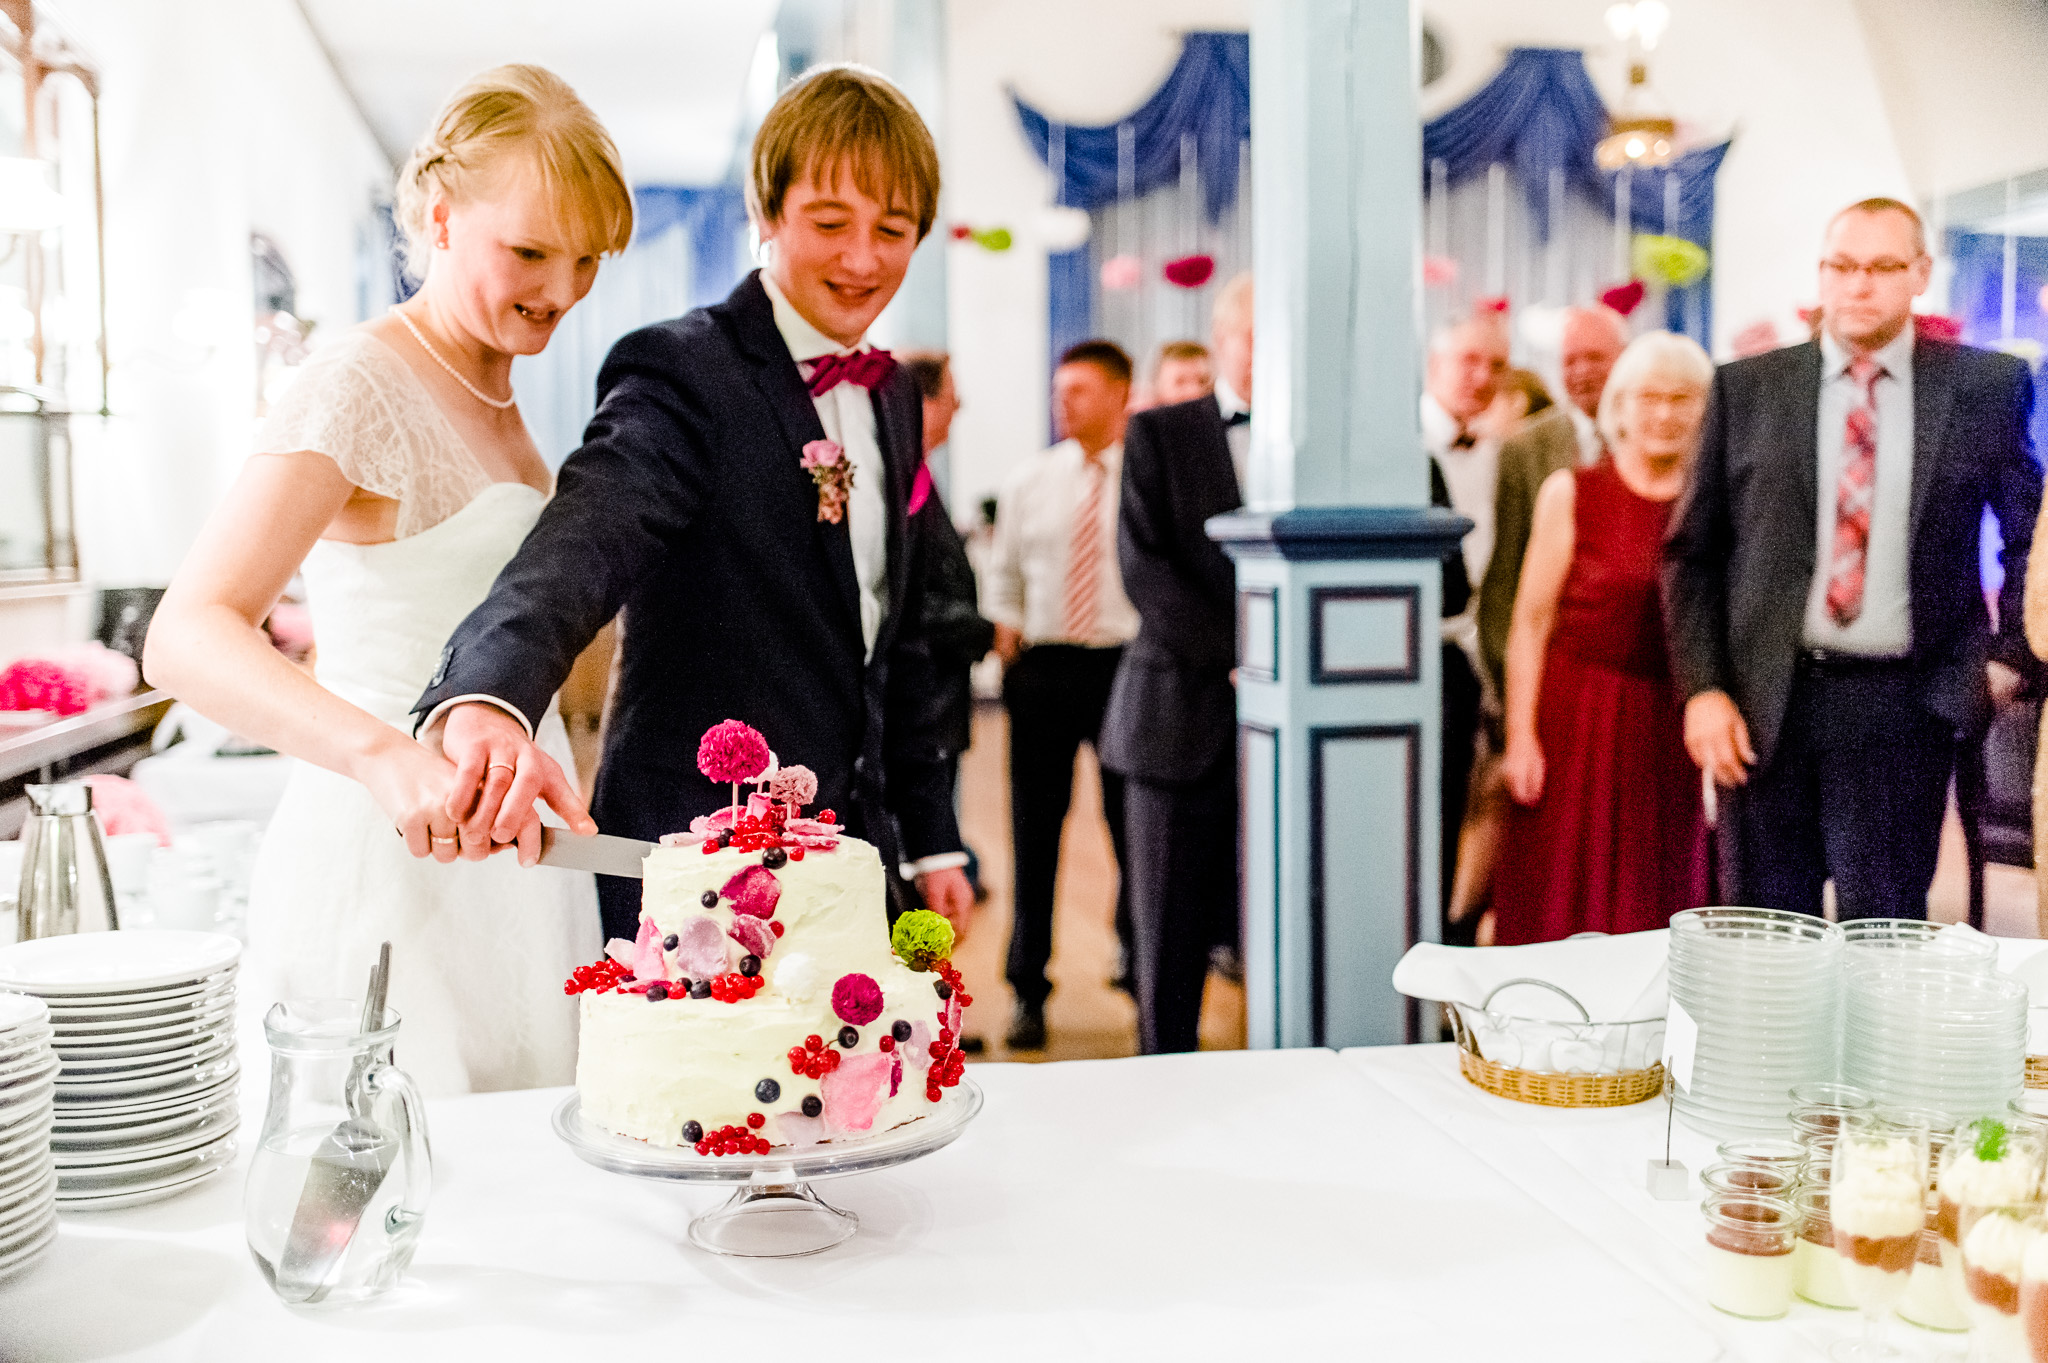 20151031-Katharina-Sascha-Hochzeit-384-web